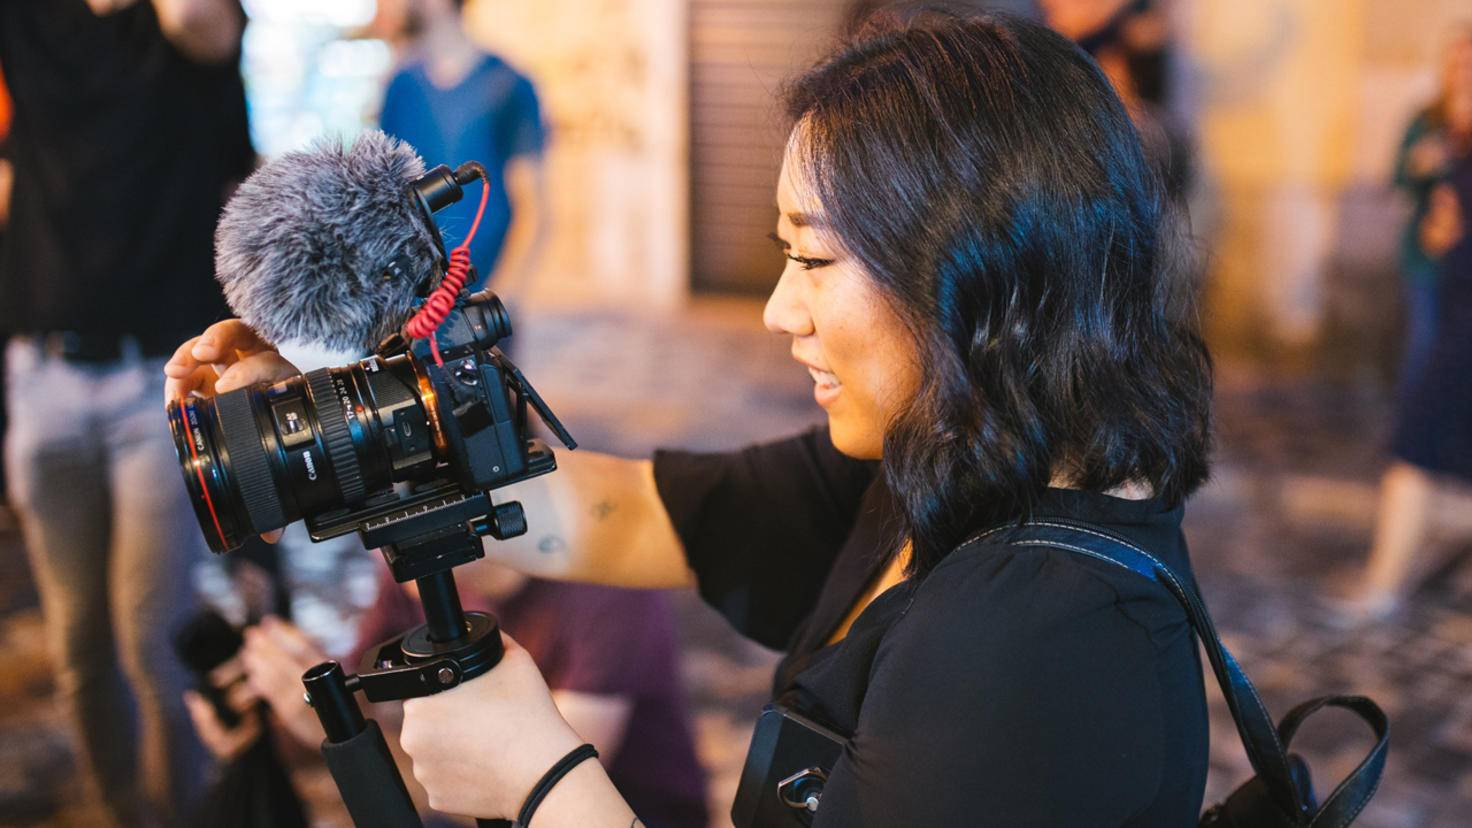 vlog-equipment-ausruestung-vlogger-zubehoer-kamera-mikro